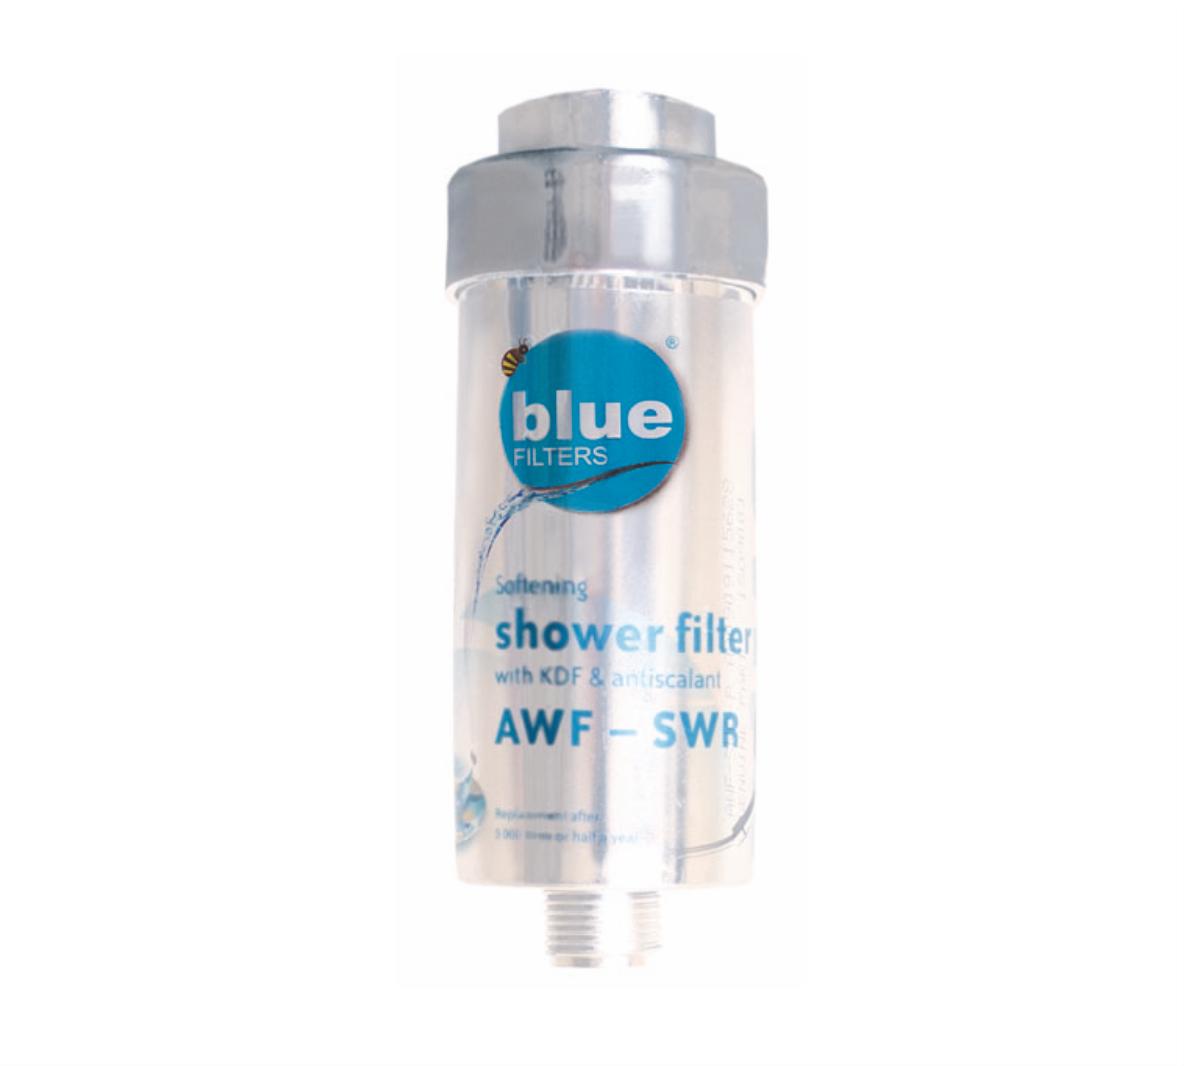 картинка Bluefilters BF-AWF-SWR фильтр для душа